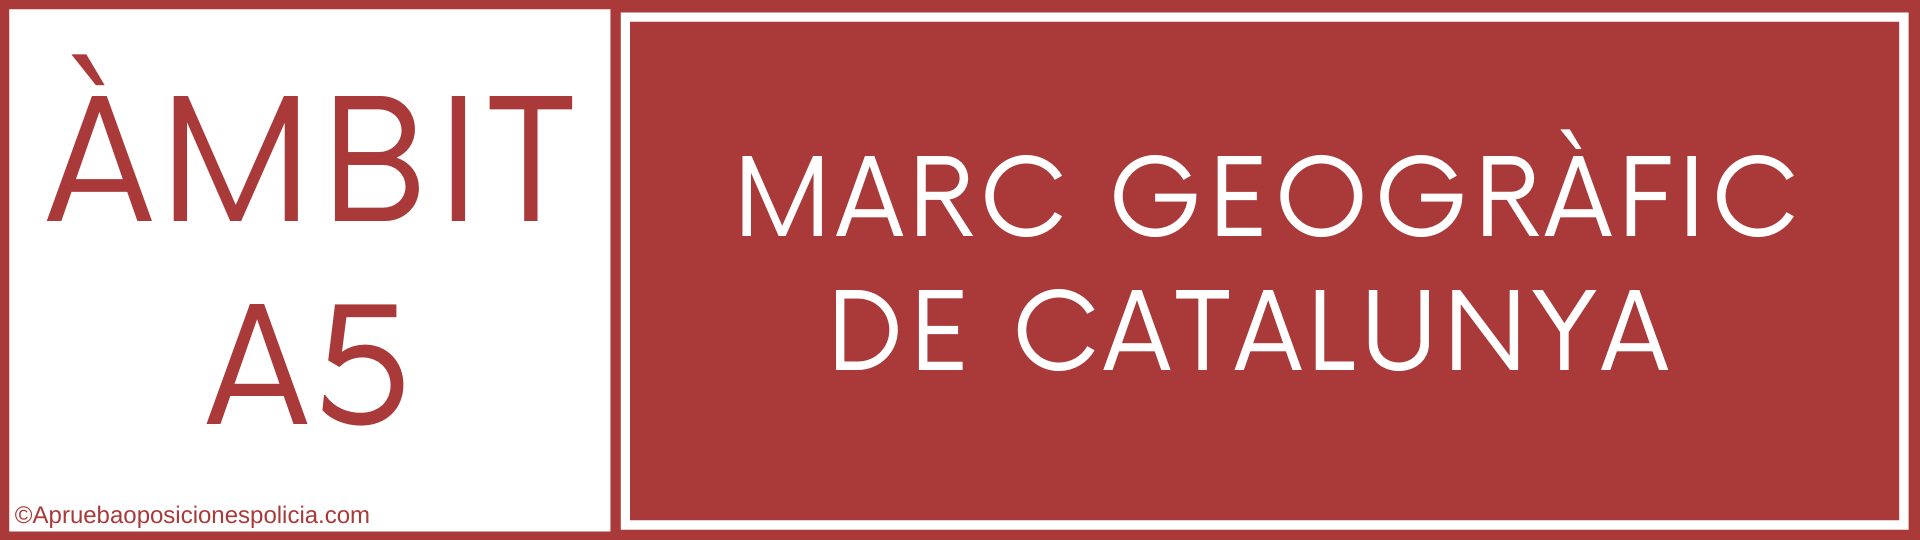 Tema a5 Mossos Marc geografic cataluña